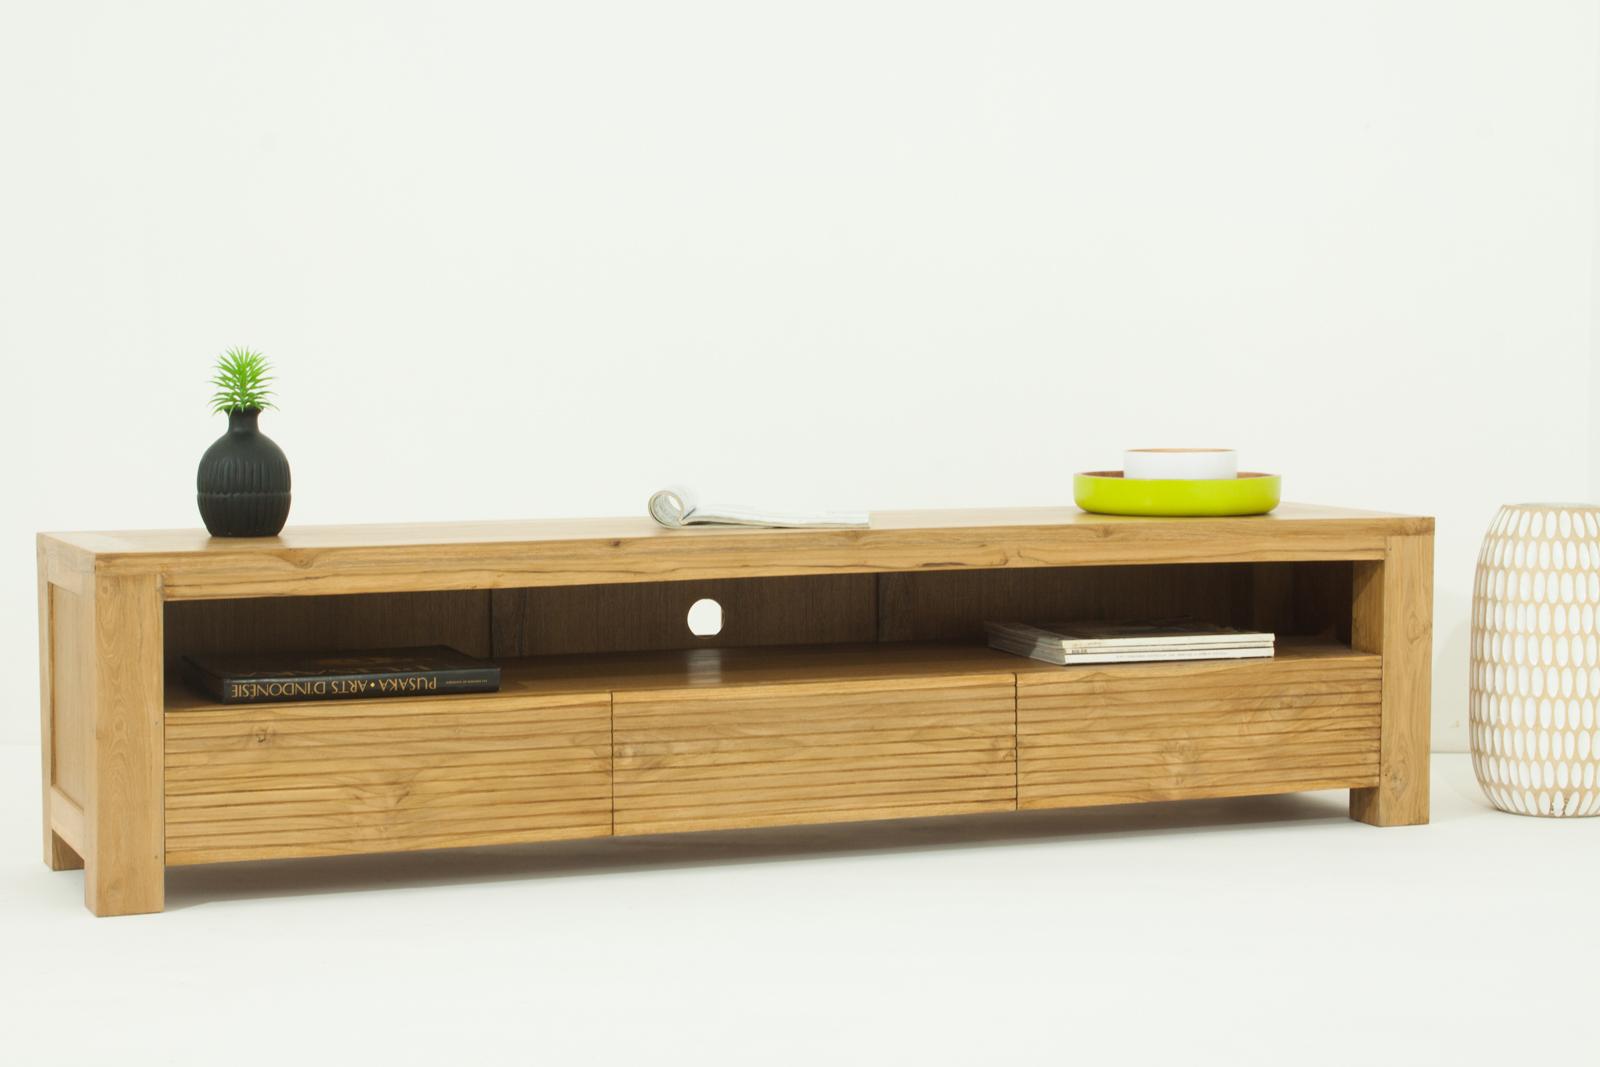 meuble tv en teck massif naturel avec 3 tiroirs et 1 grande niche 170x40x40cm gariss meubles tv pier import